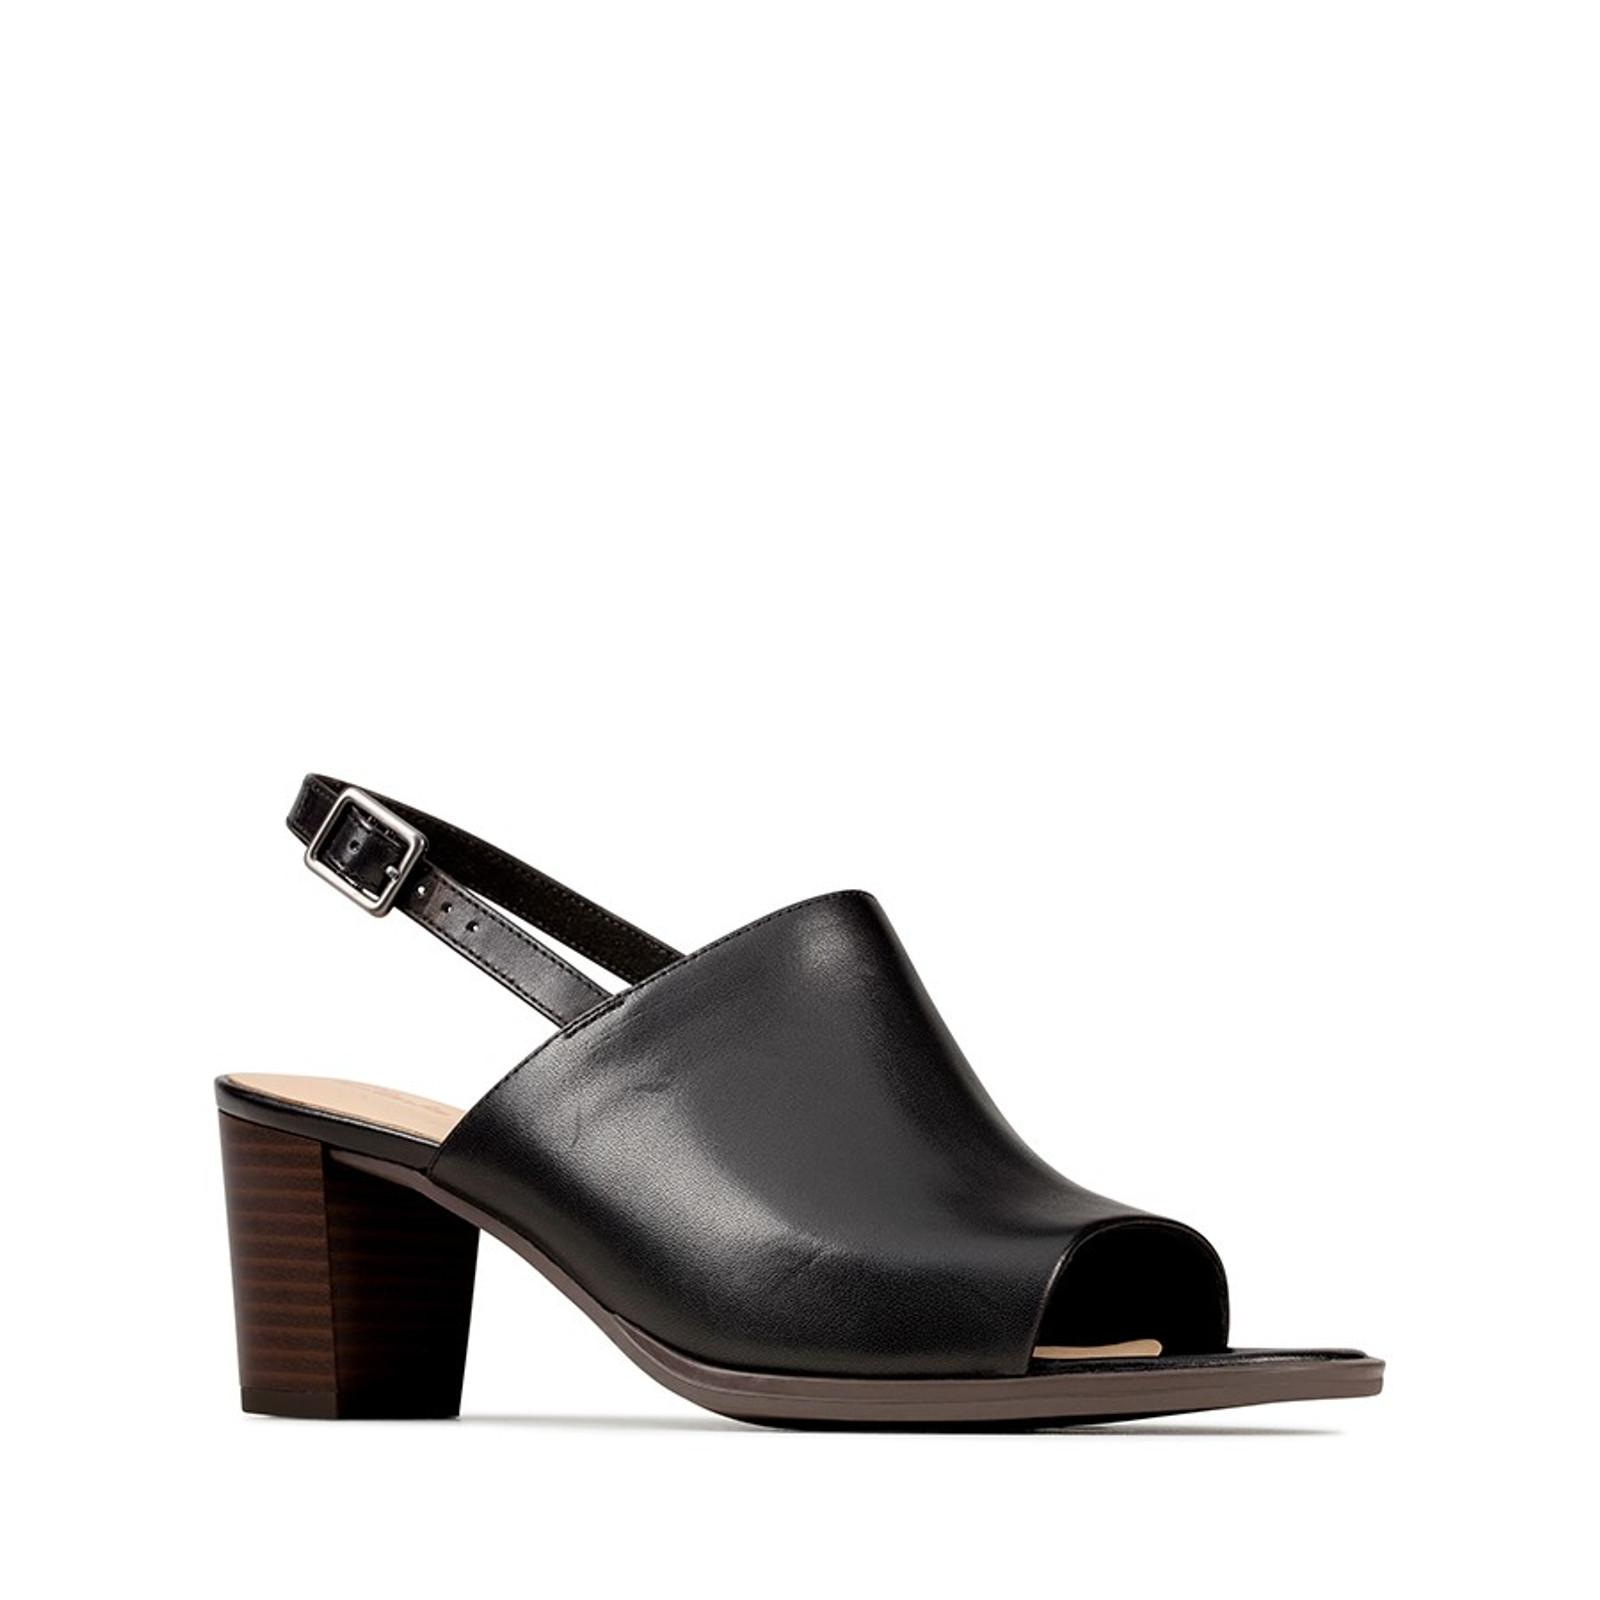 Clarks Womens KAYLIN60 SLING Black Leather